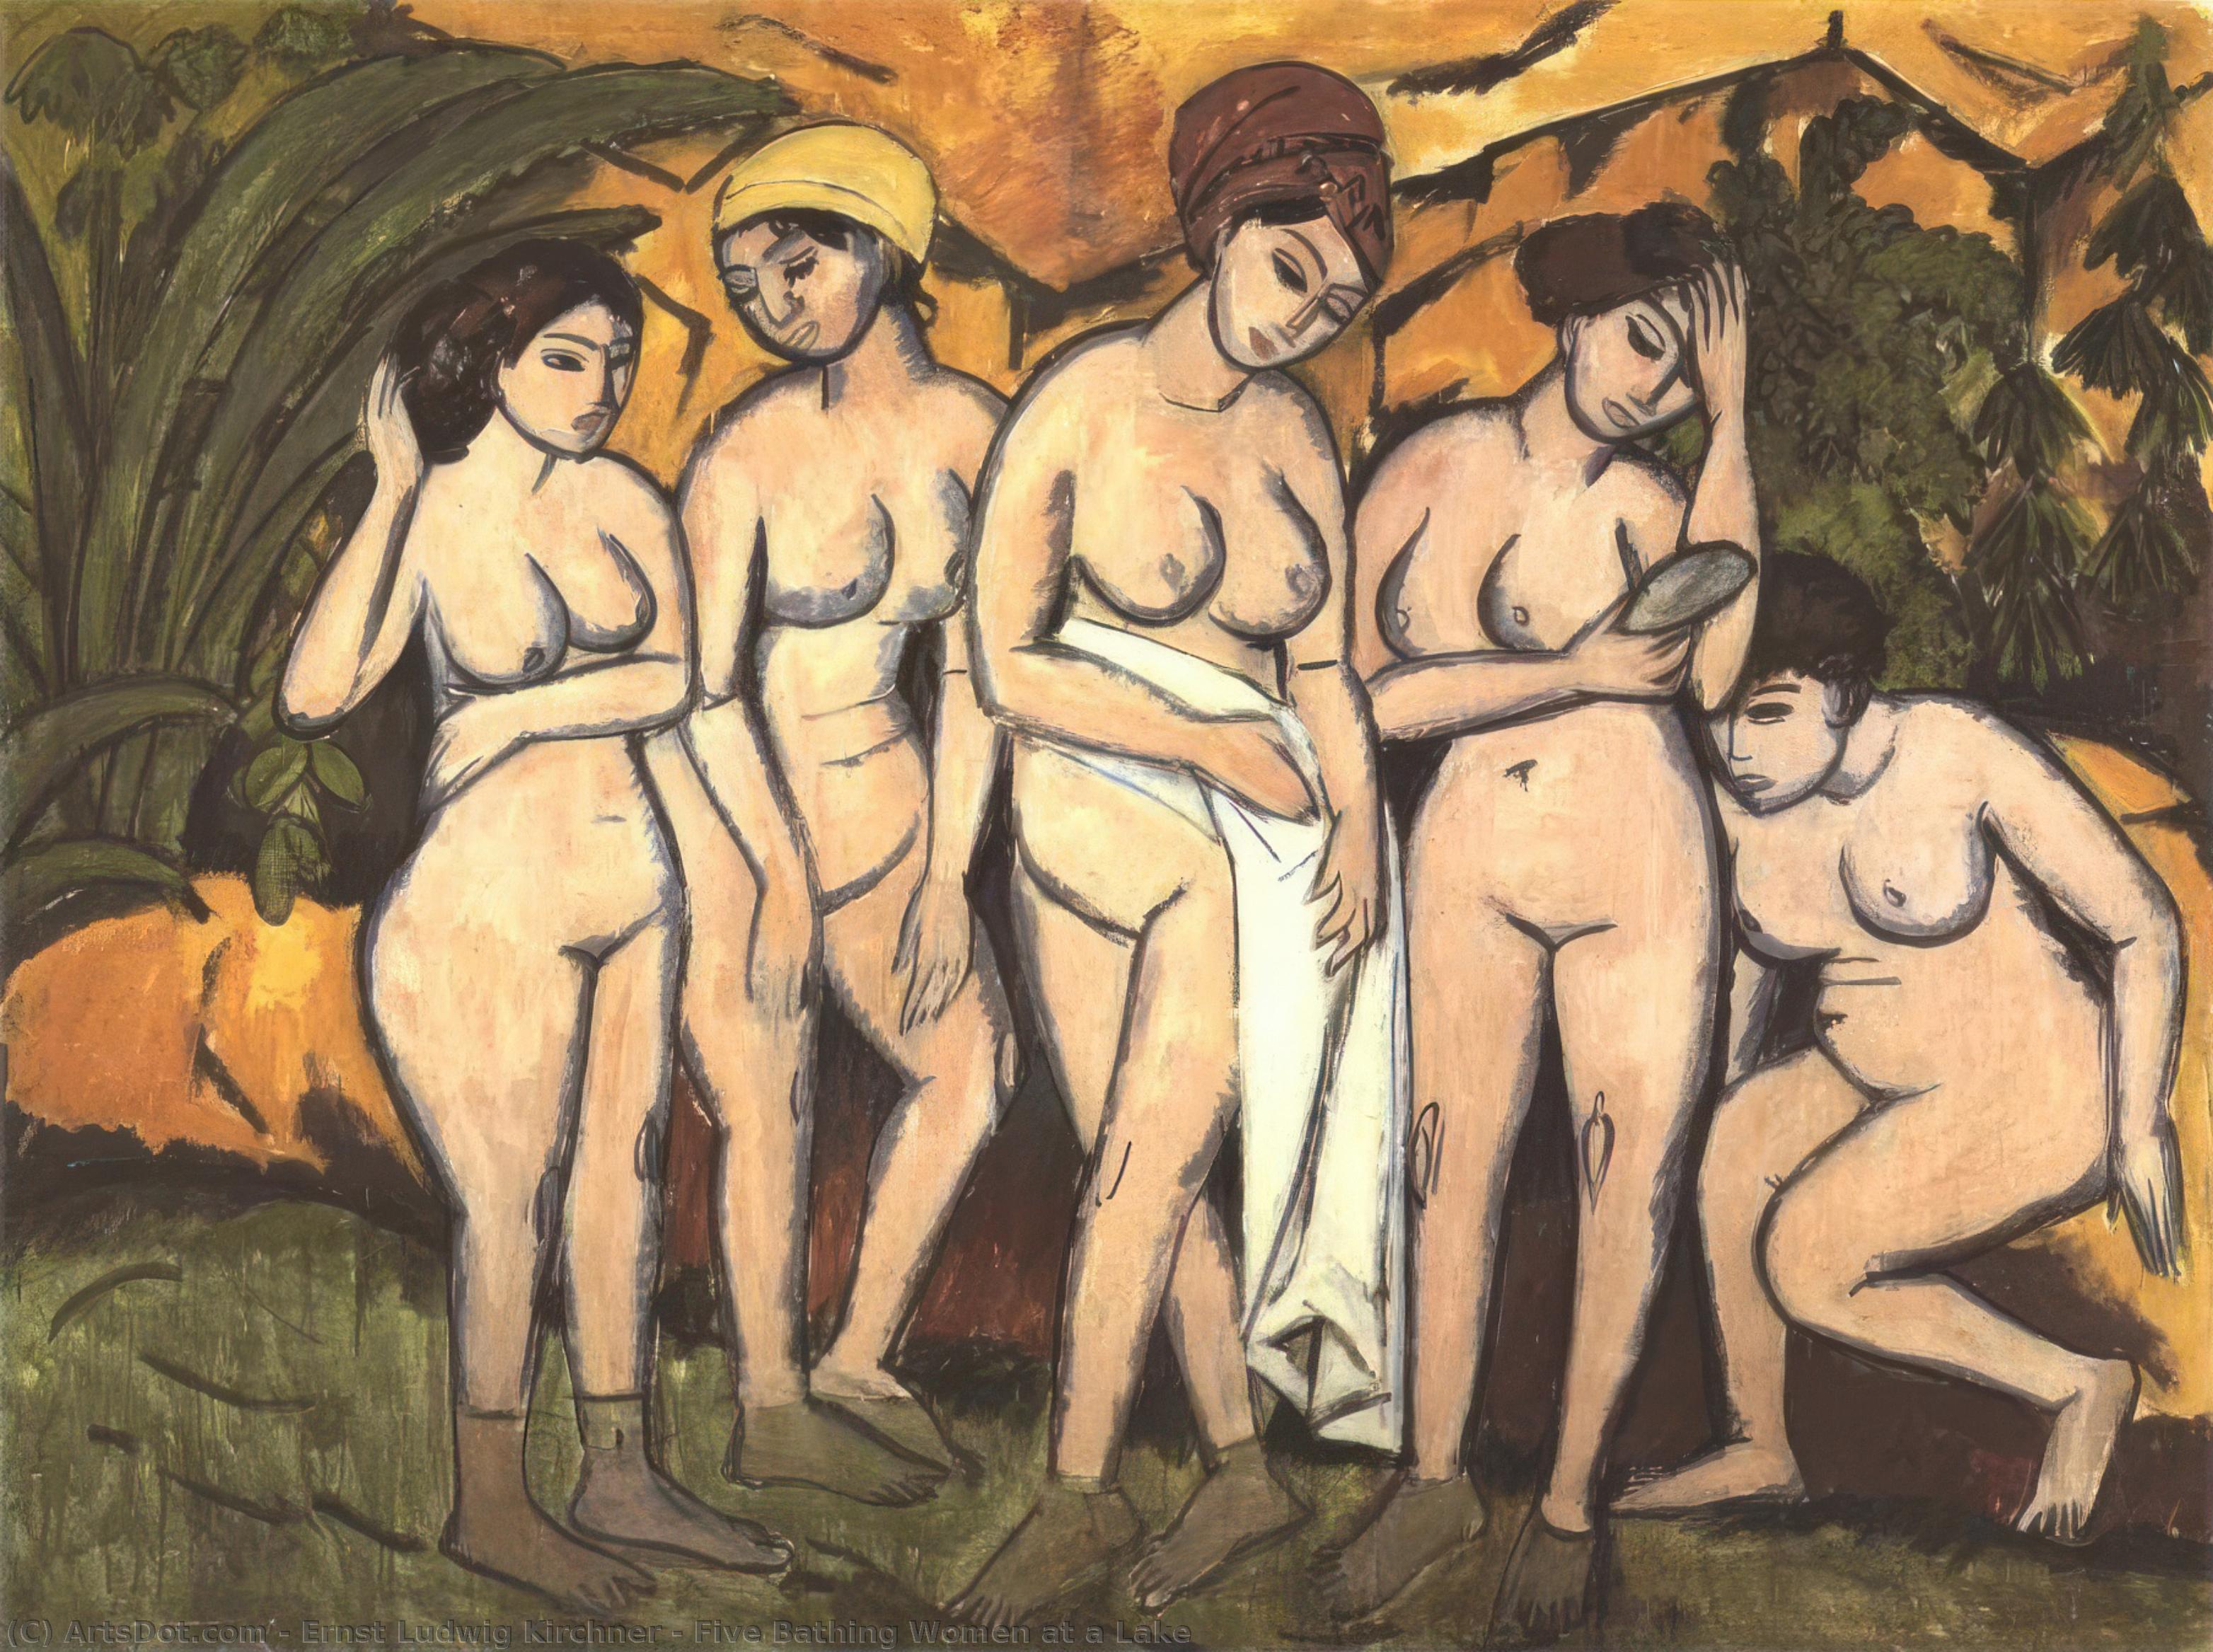 Wikoo.org - موسوعة الفنون الجميلة - اللوحة، العمل الفني Ernst Ludwig Kirchner - Five Bathing Women at a Lake